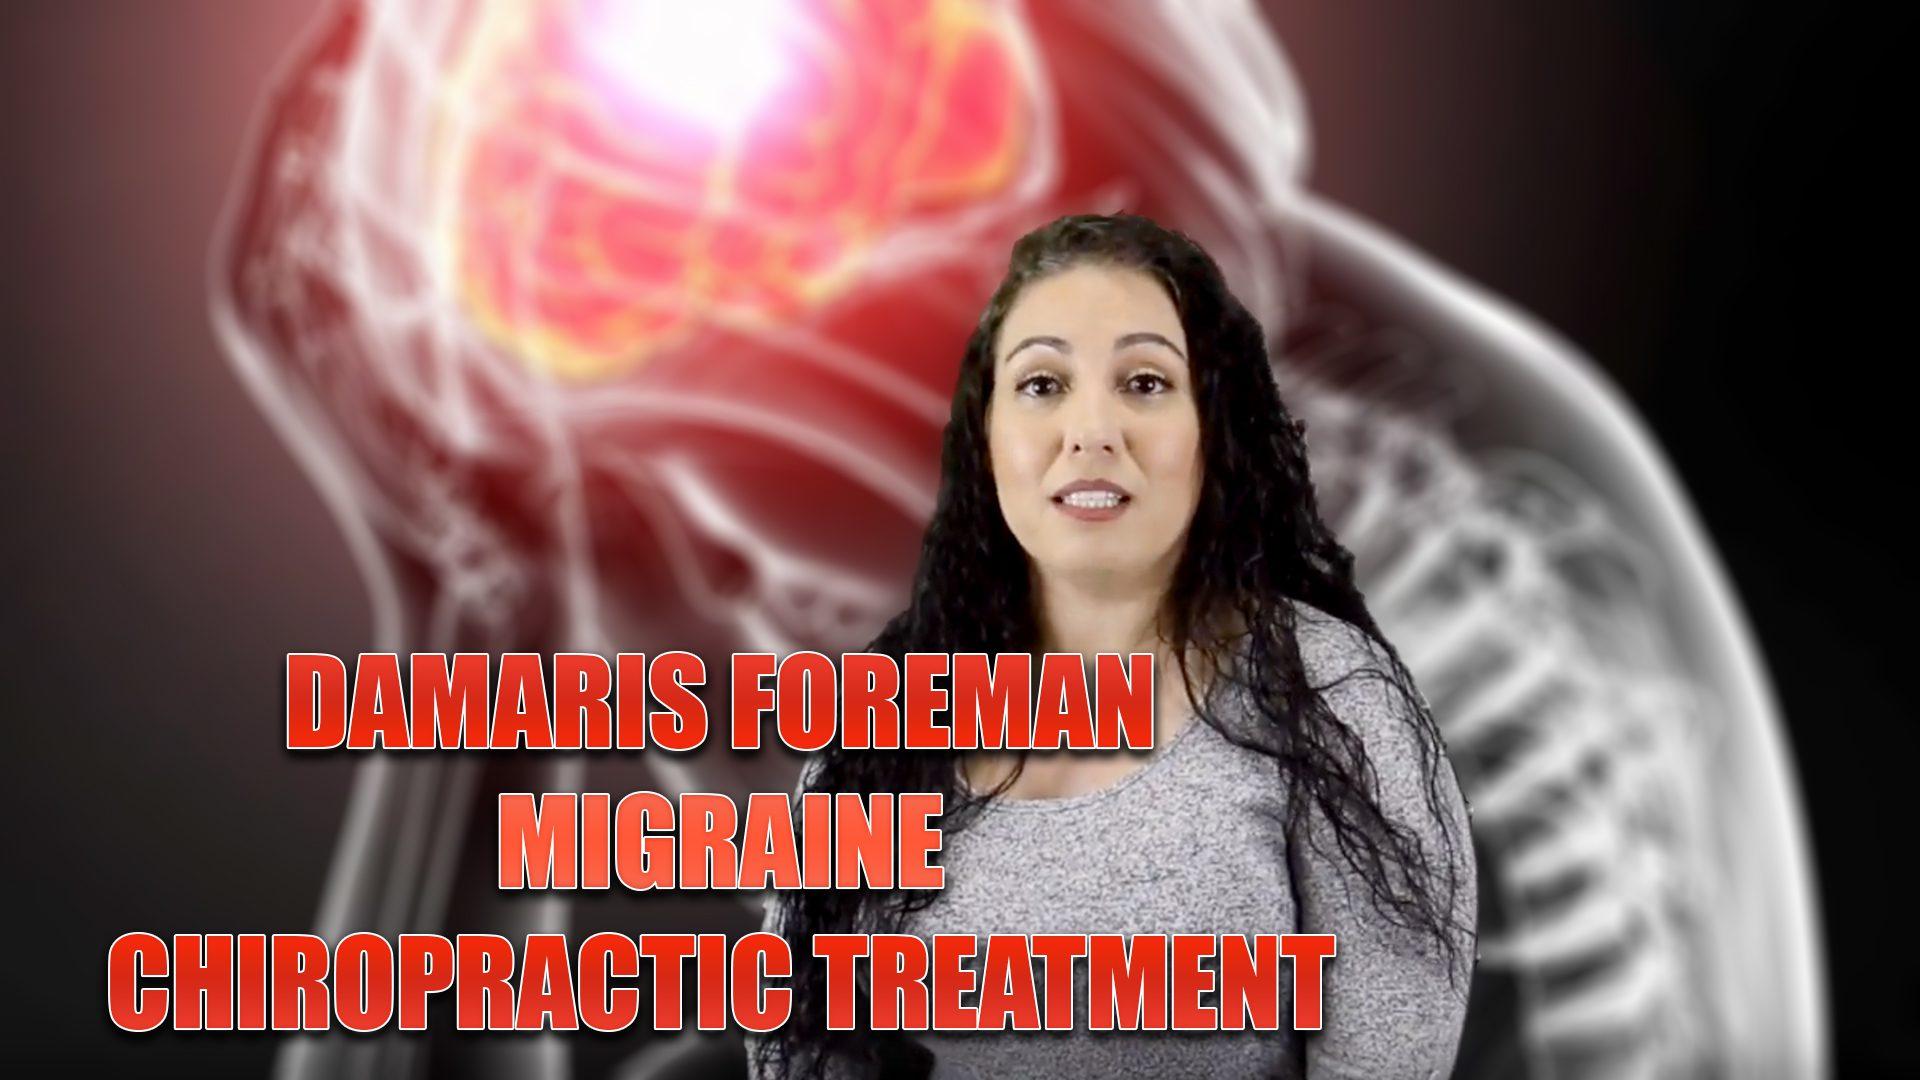 migraine treatment chiropractic el paso tx.